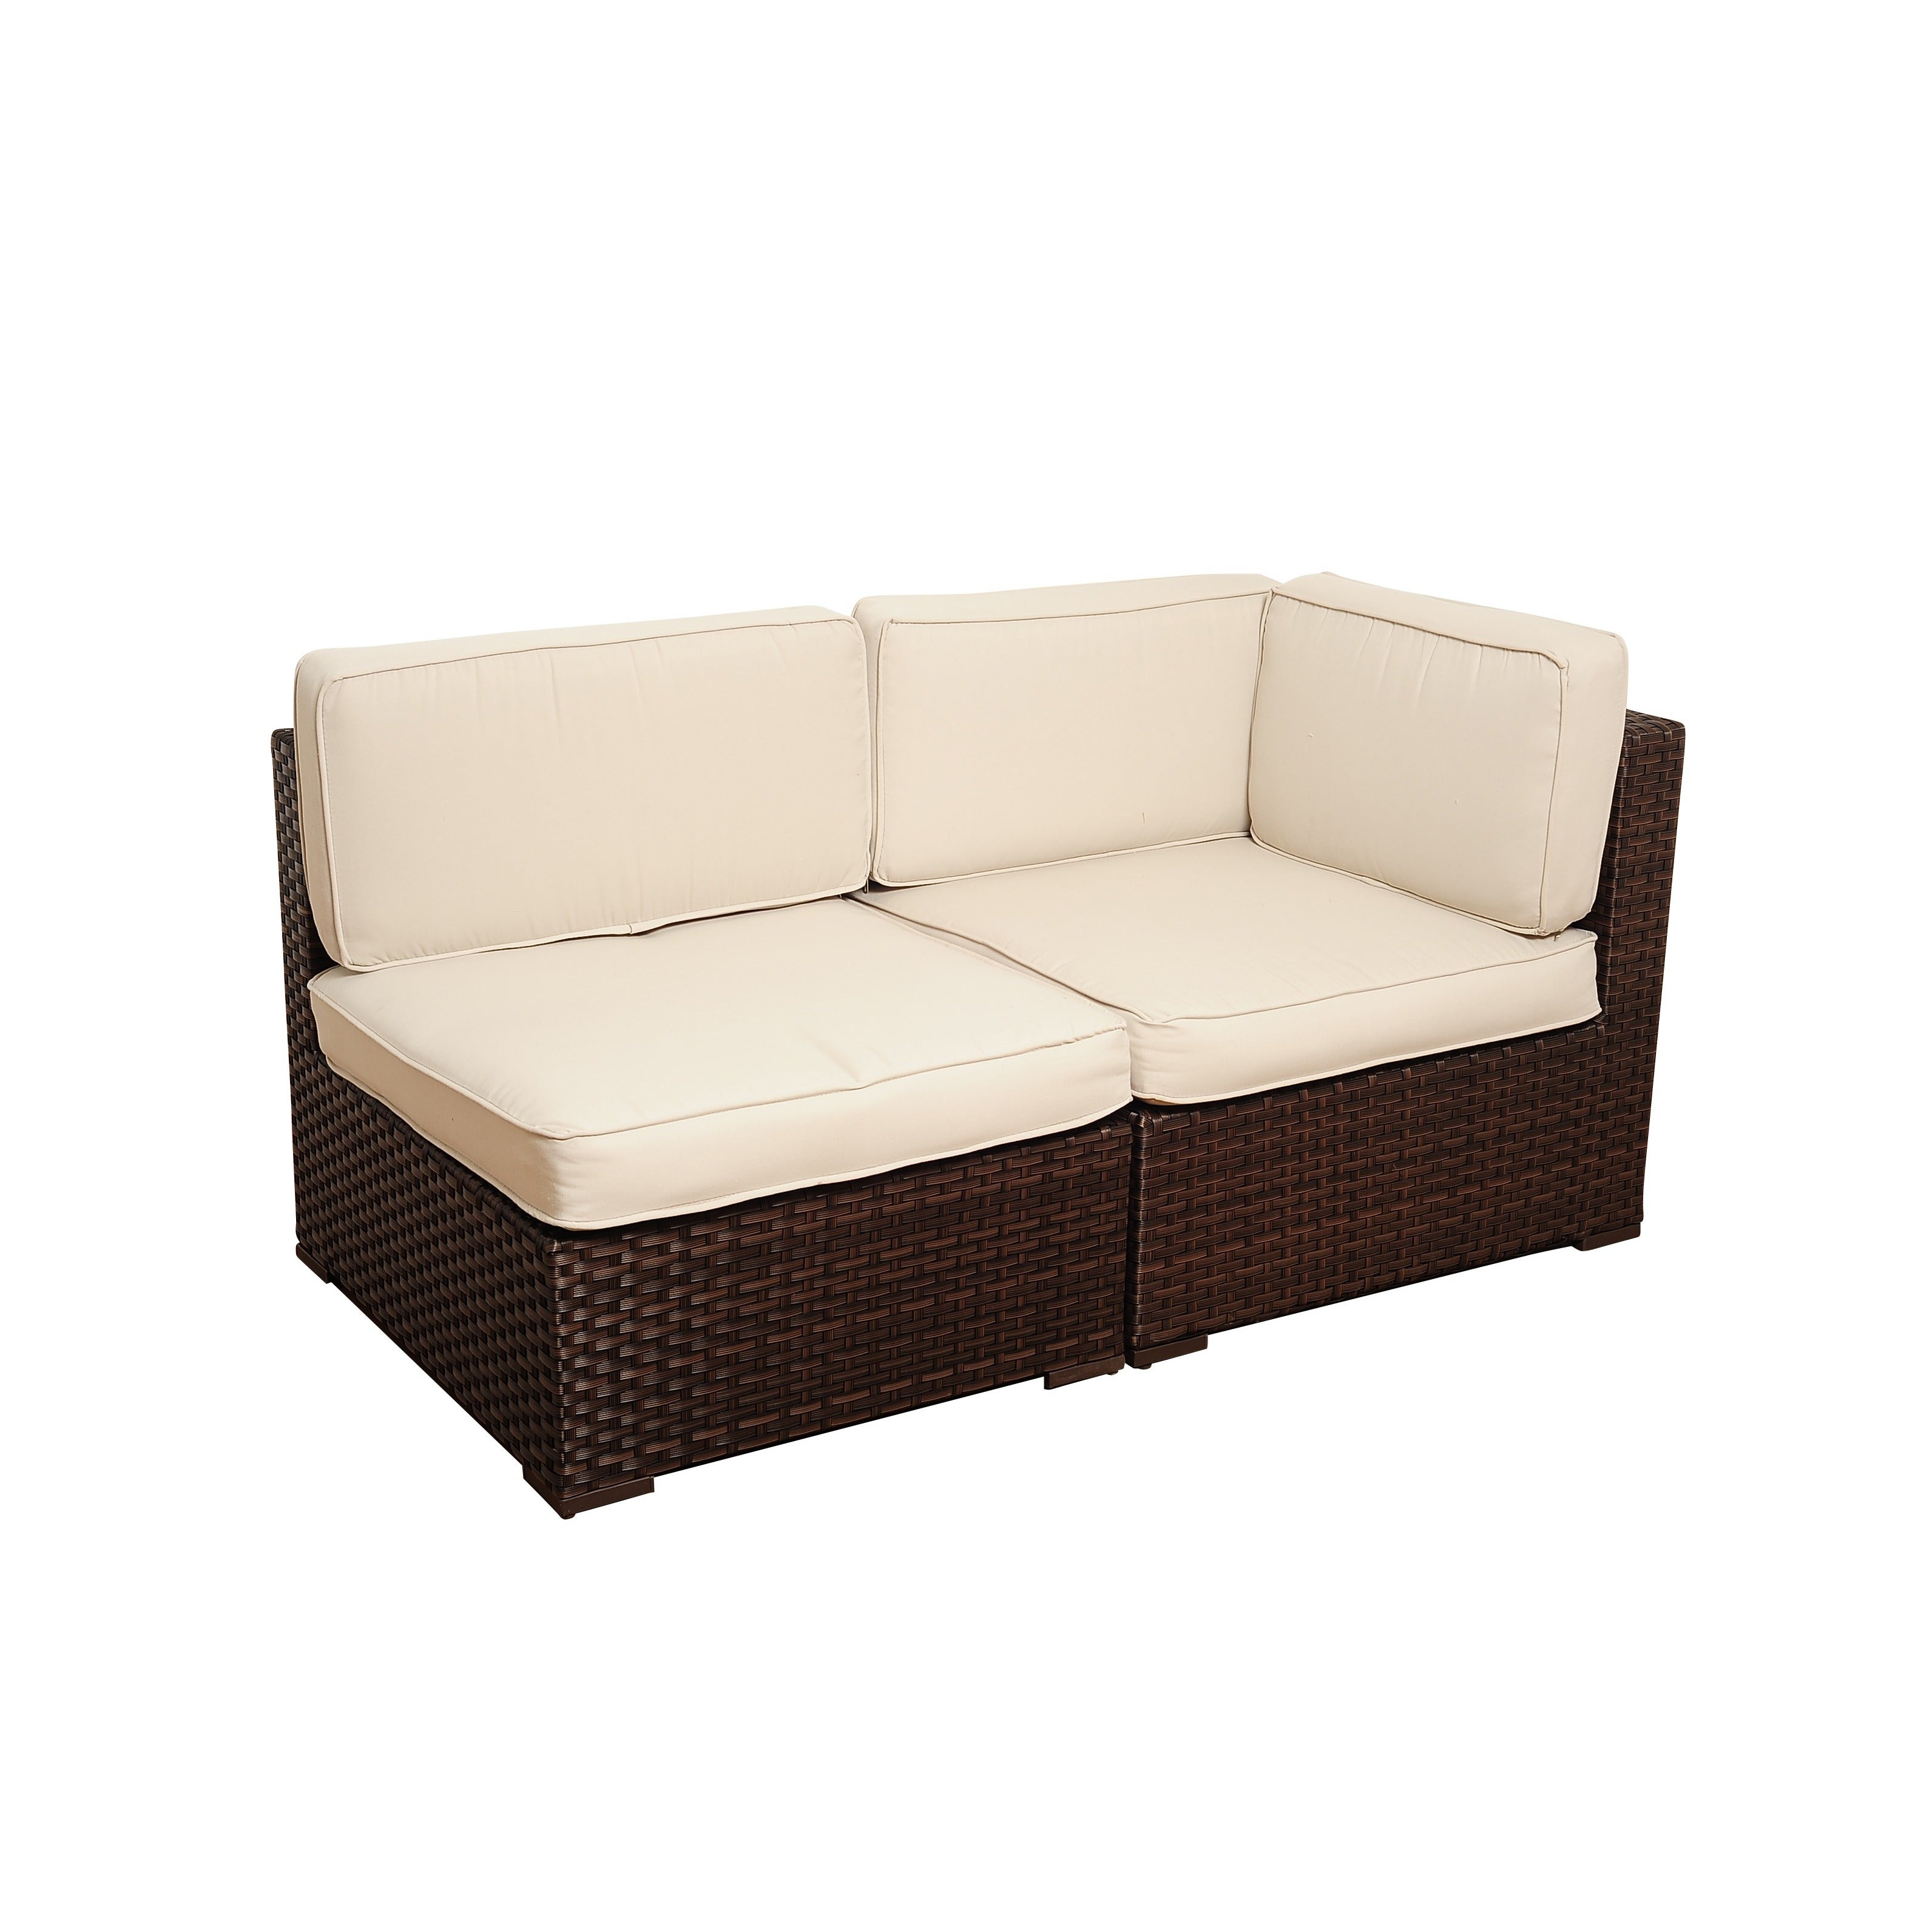 Atlantic Milano 10 Piece Patio Furniture Set Free Shipping Today  ~ Patio Sofa And Loveseat